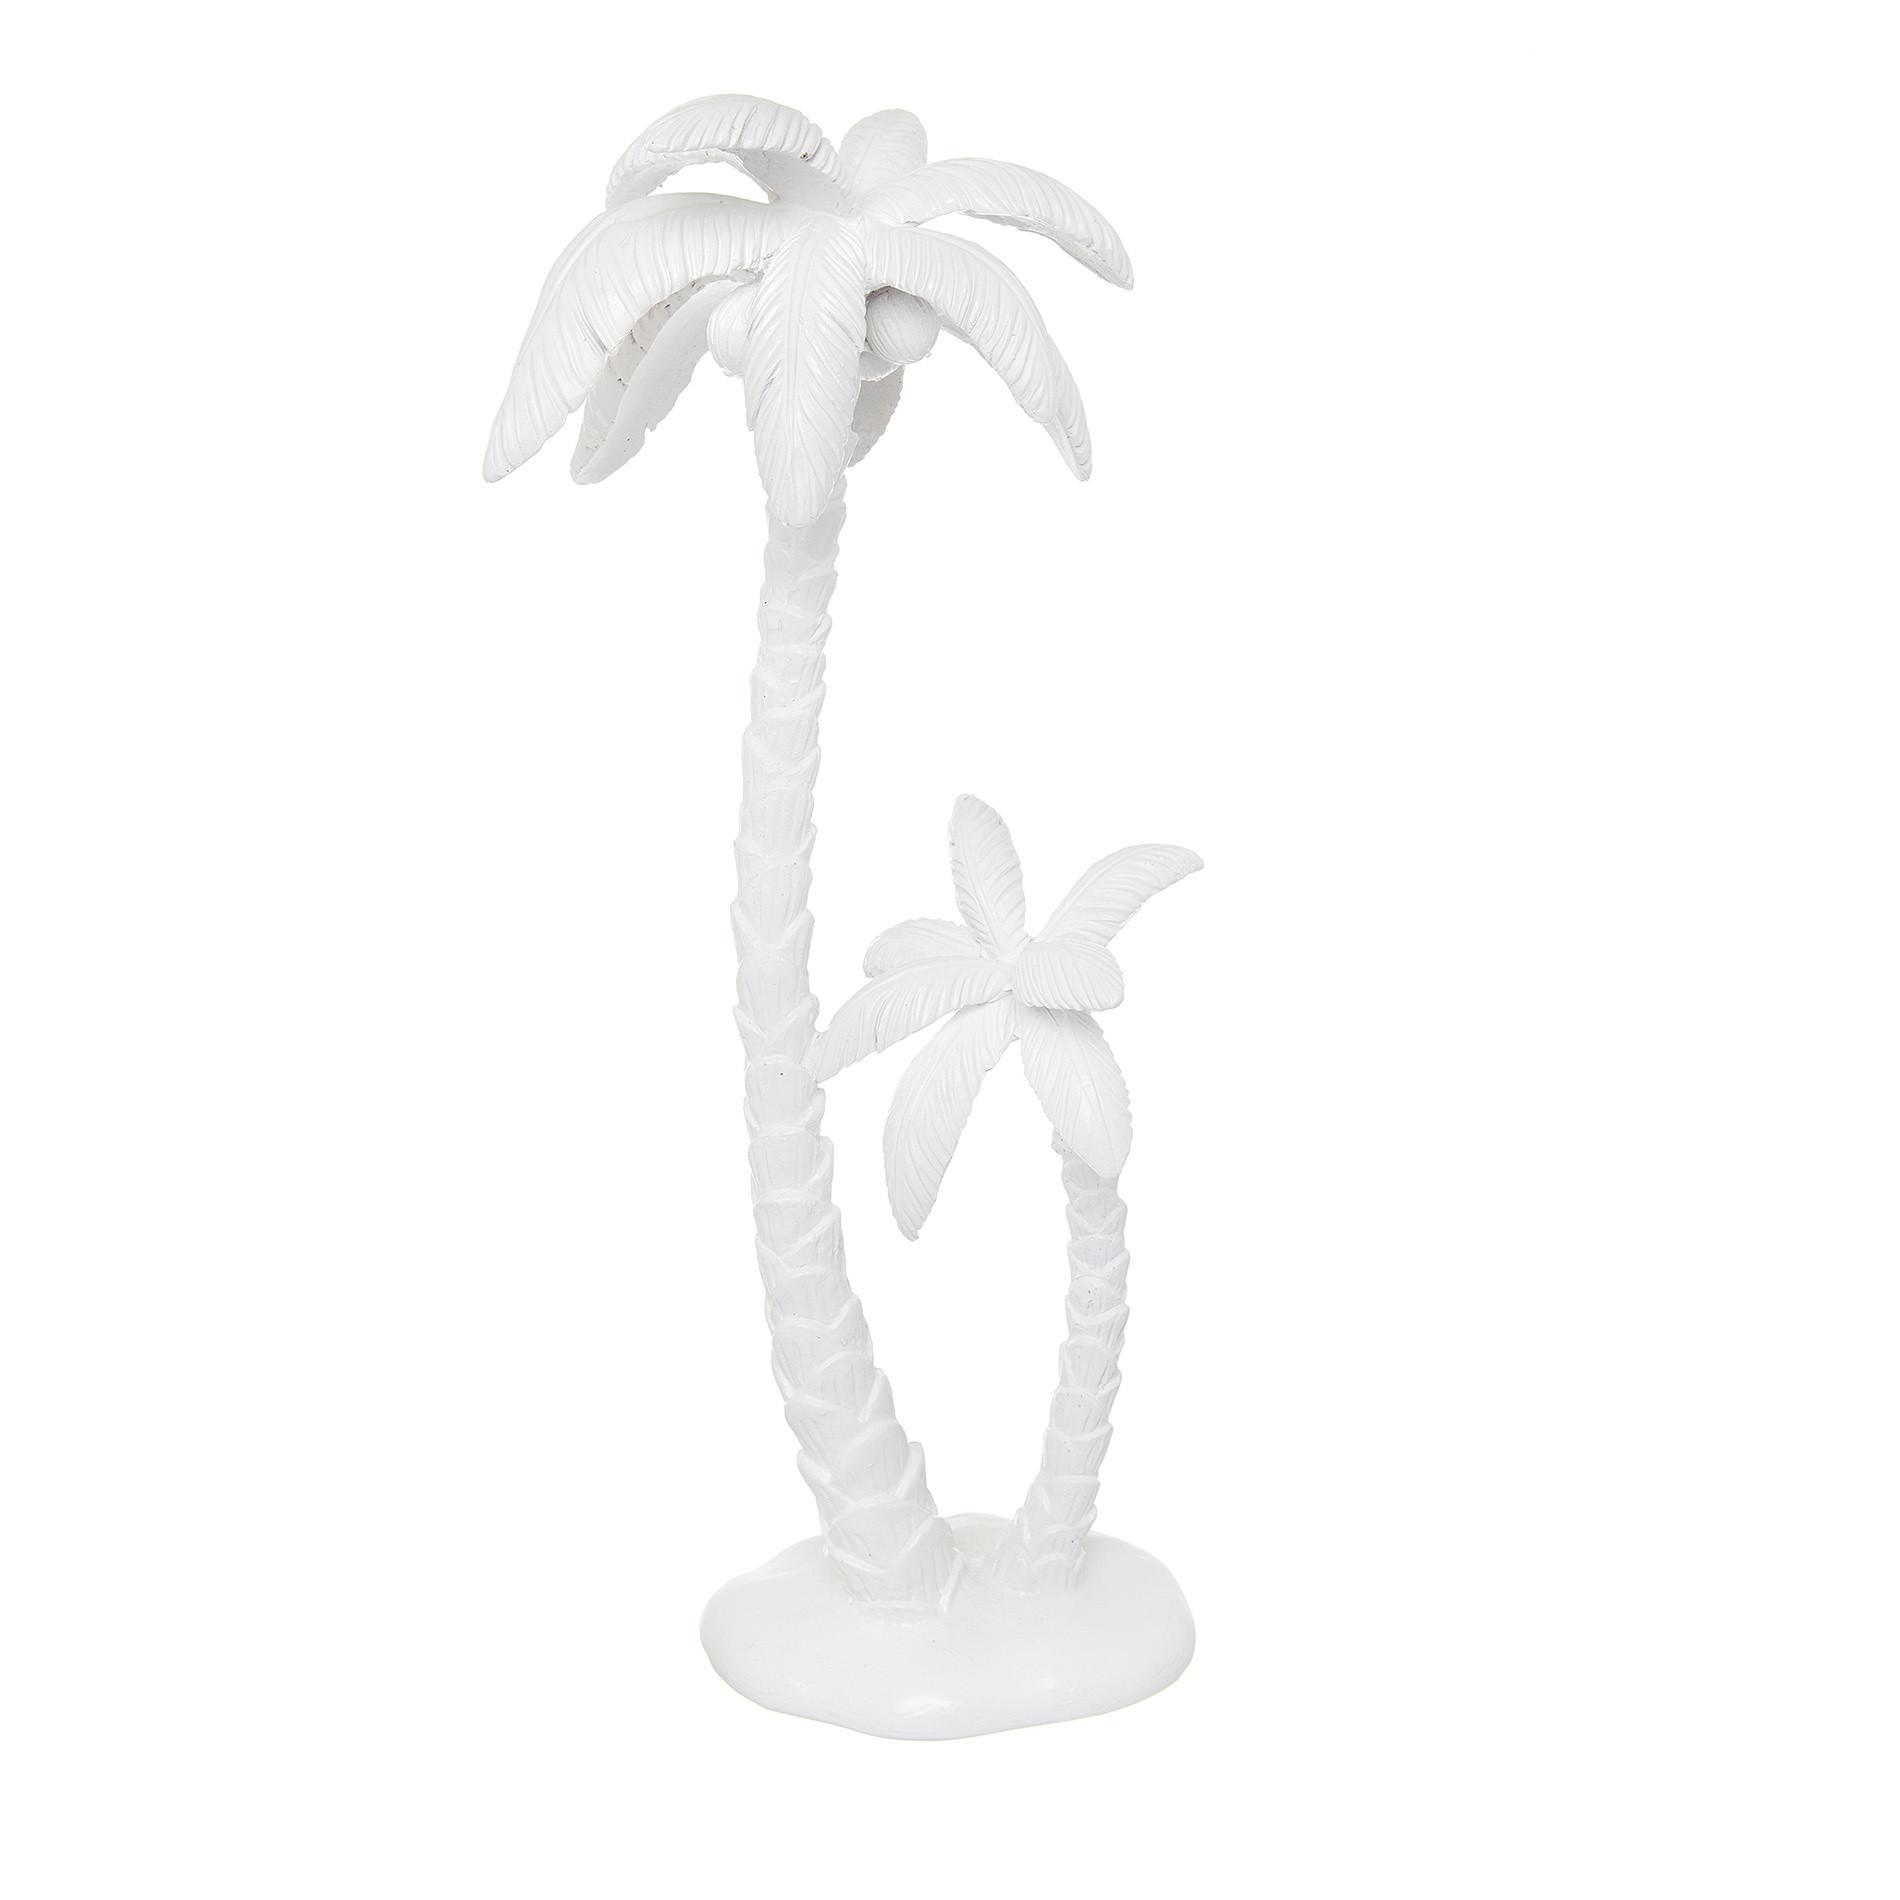 Palma decorativa rifinita a mano, Bianco, large image number 0